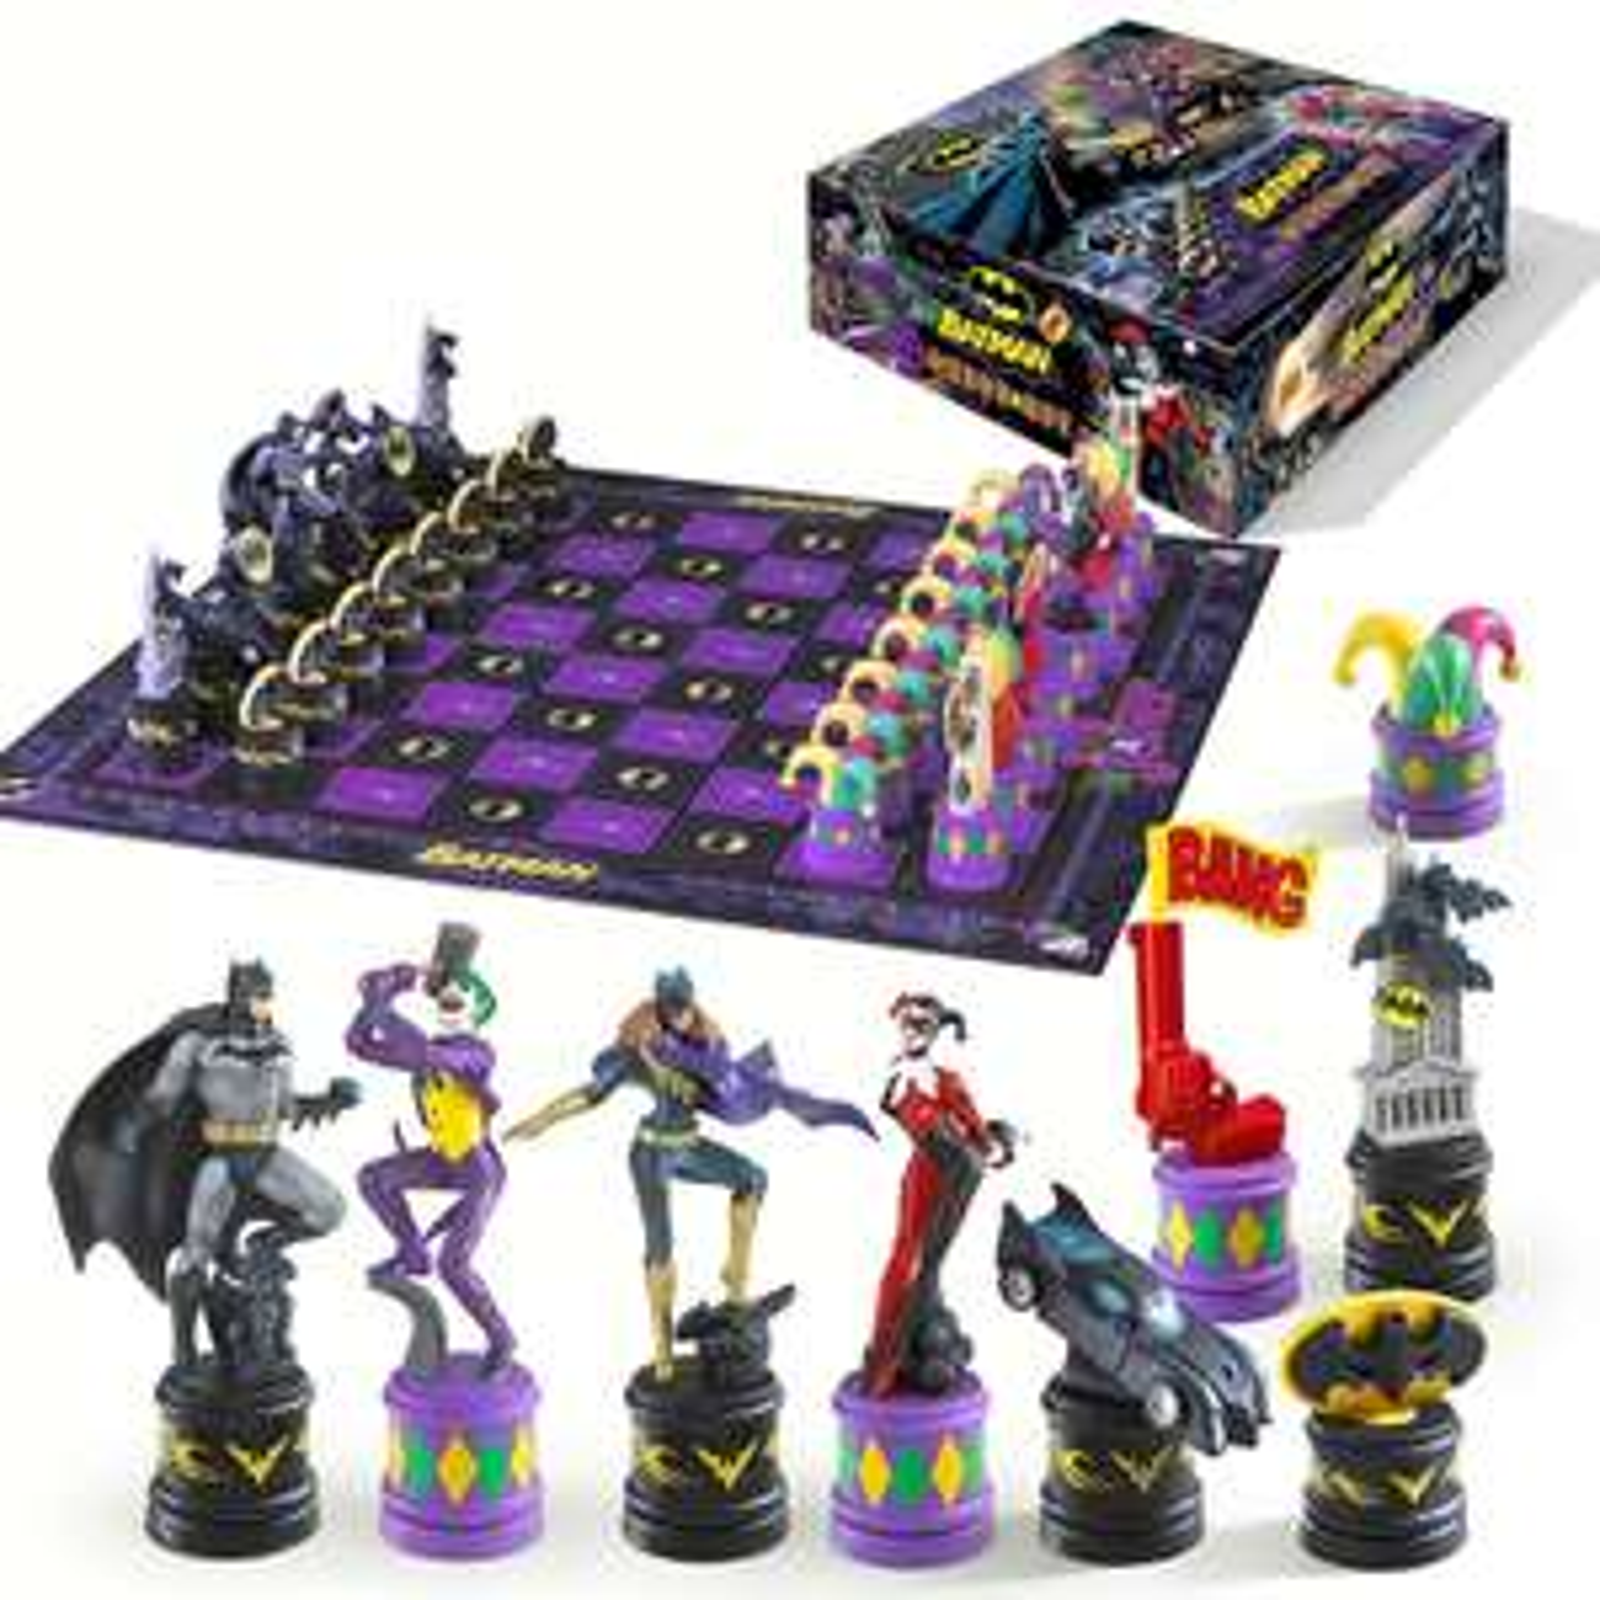 Officially authorized DC Comics The Dark Knight Batman Chess Set £24.99 delivered @ Zavvi